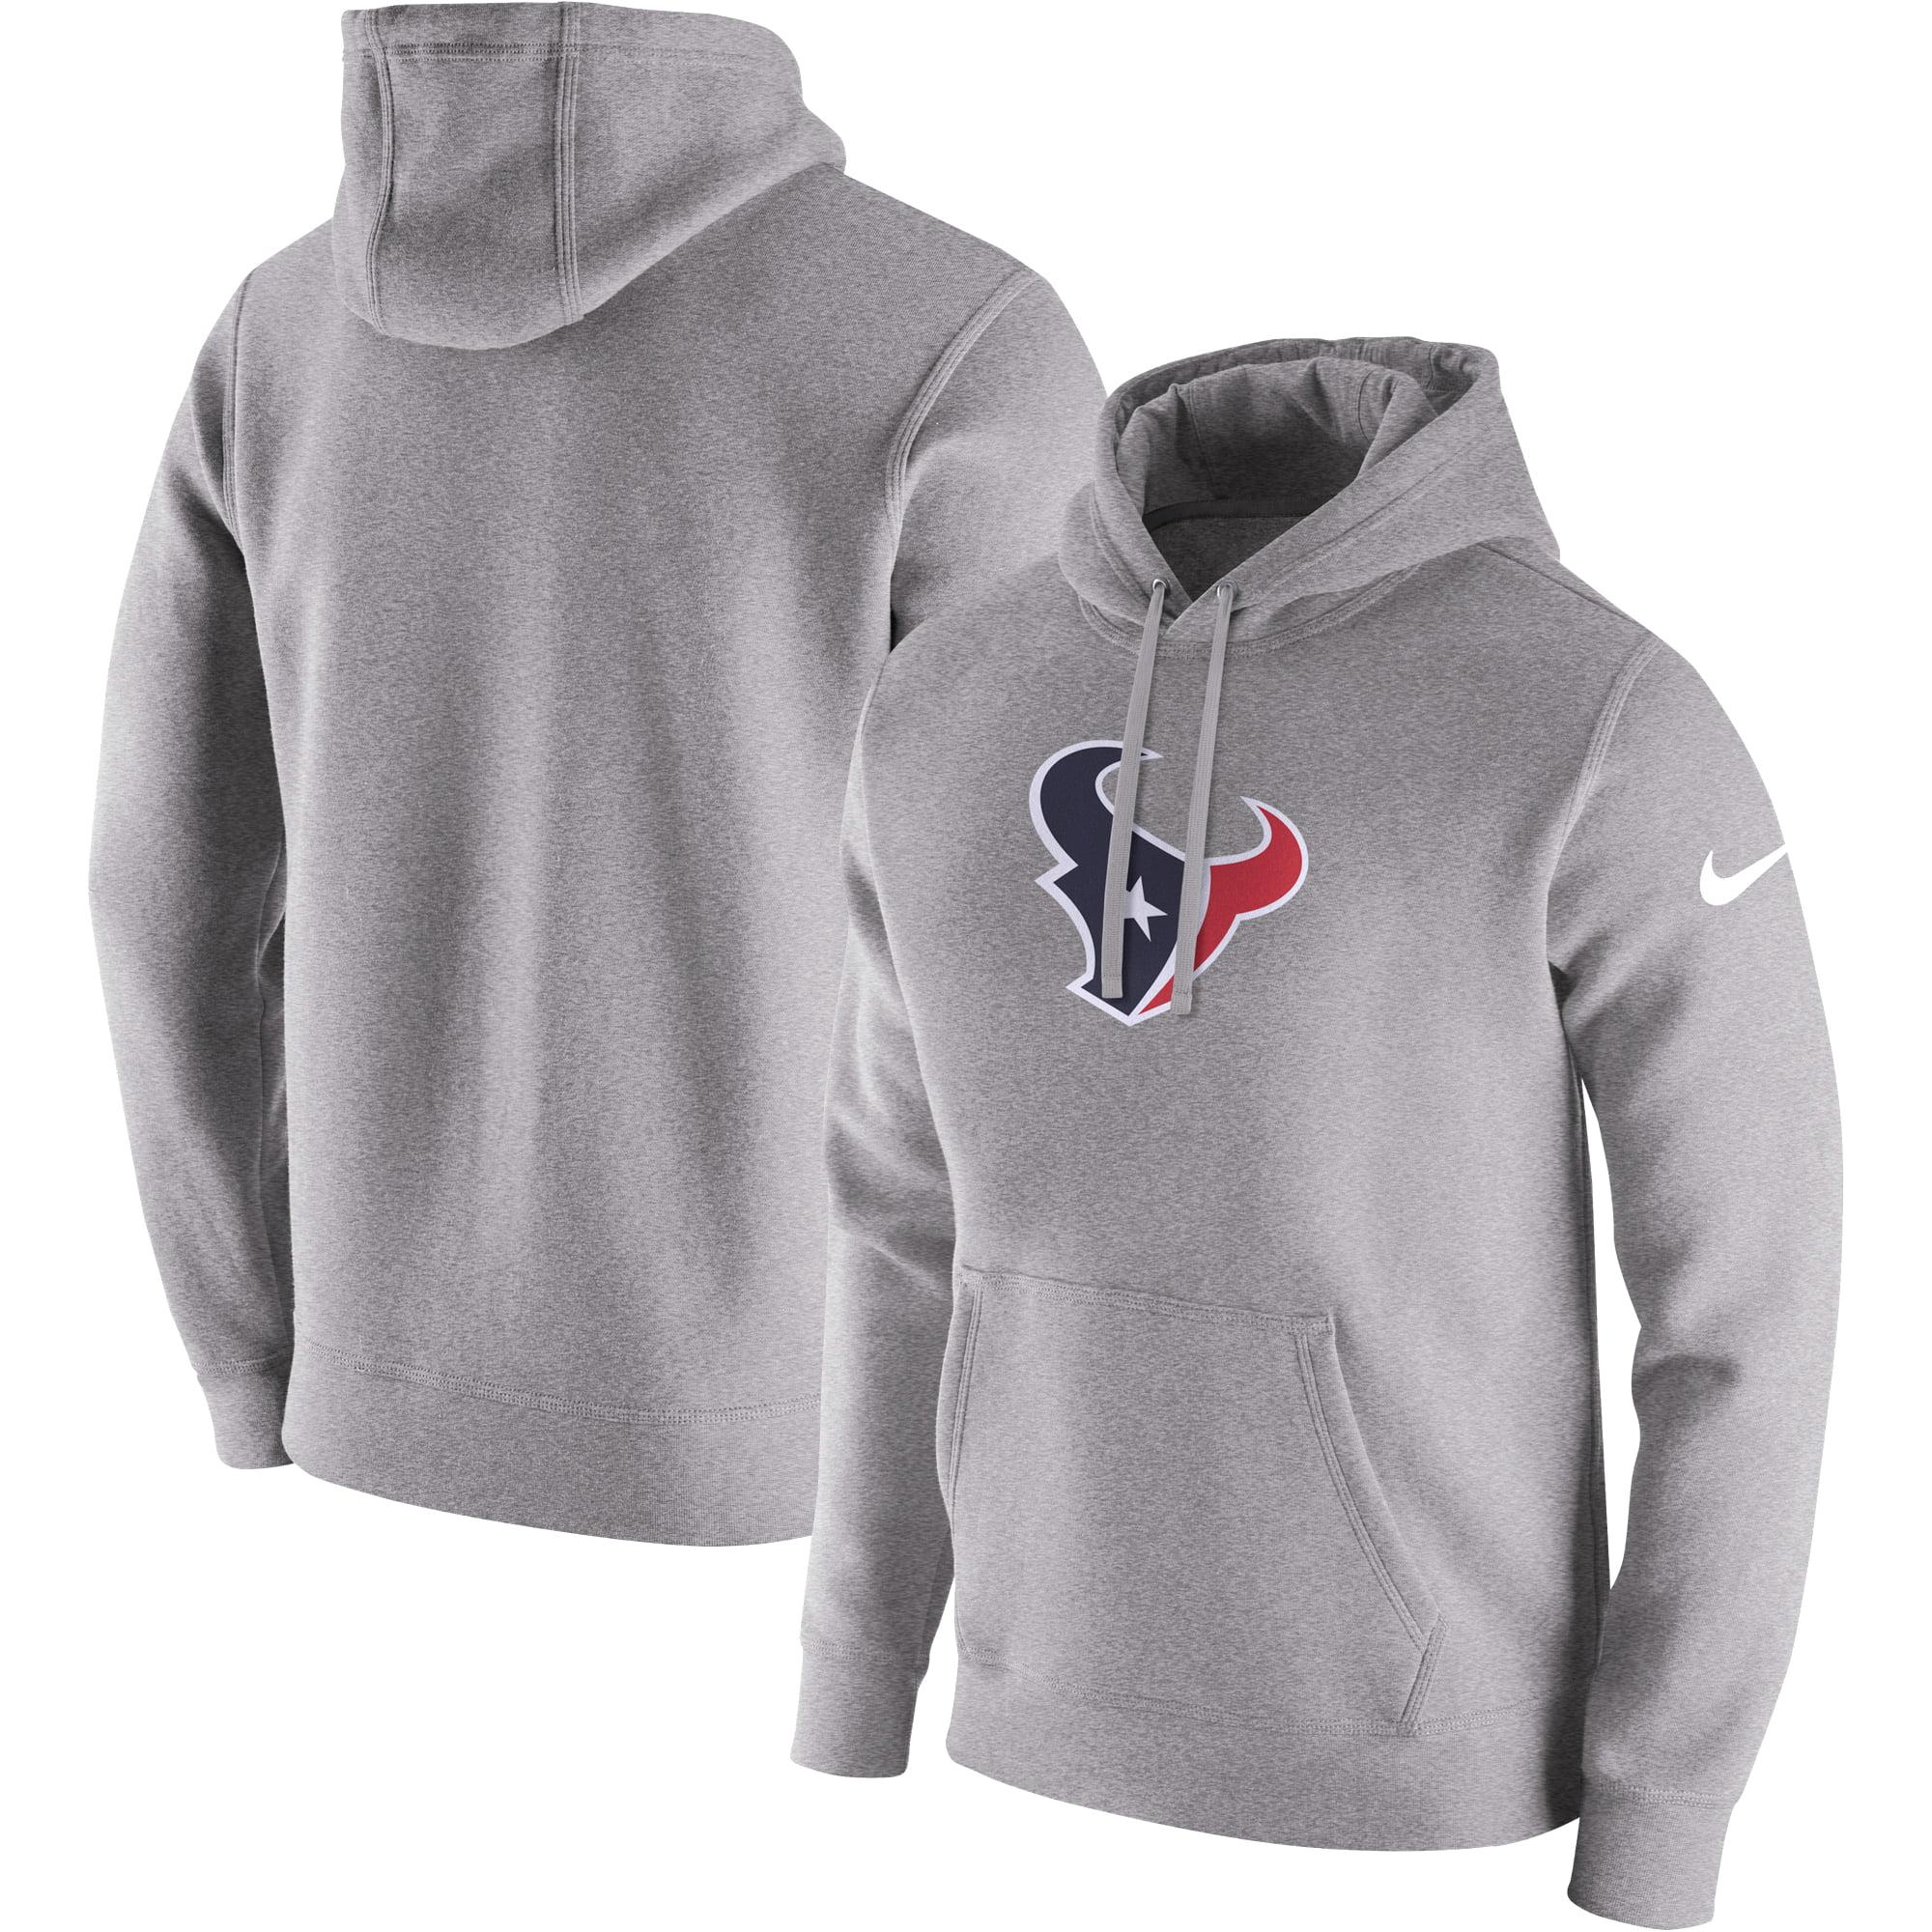 Houston Texans Nike Club Fleece Pullover Hoodie - Heathered Gray